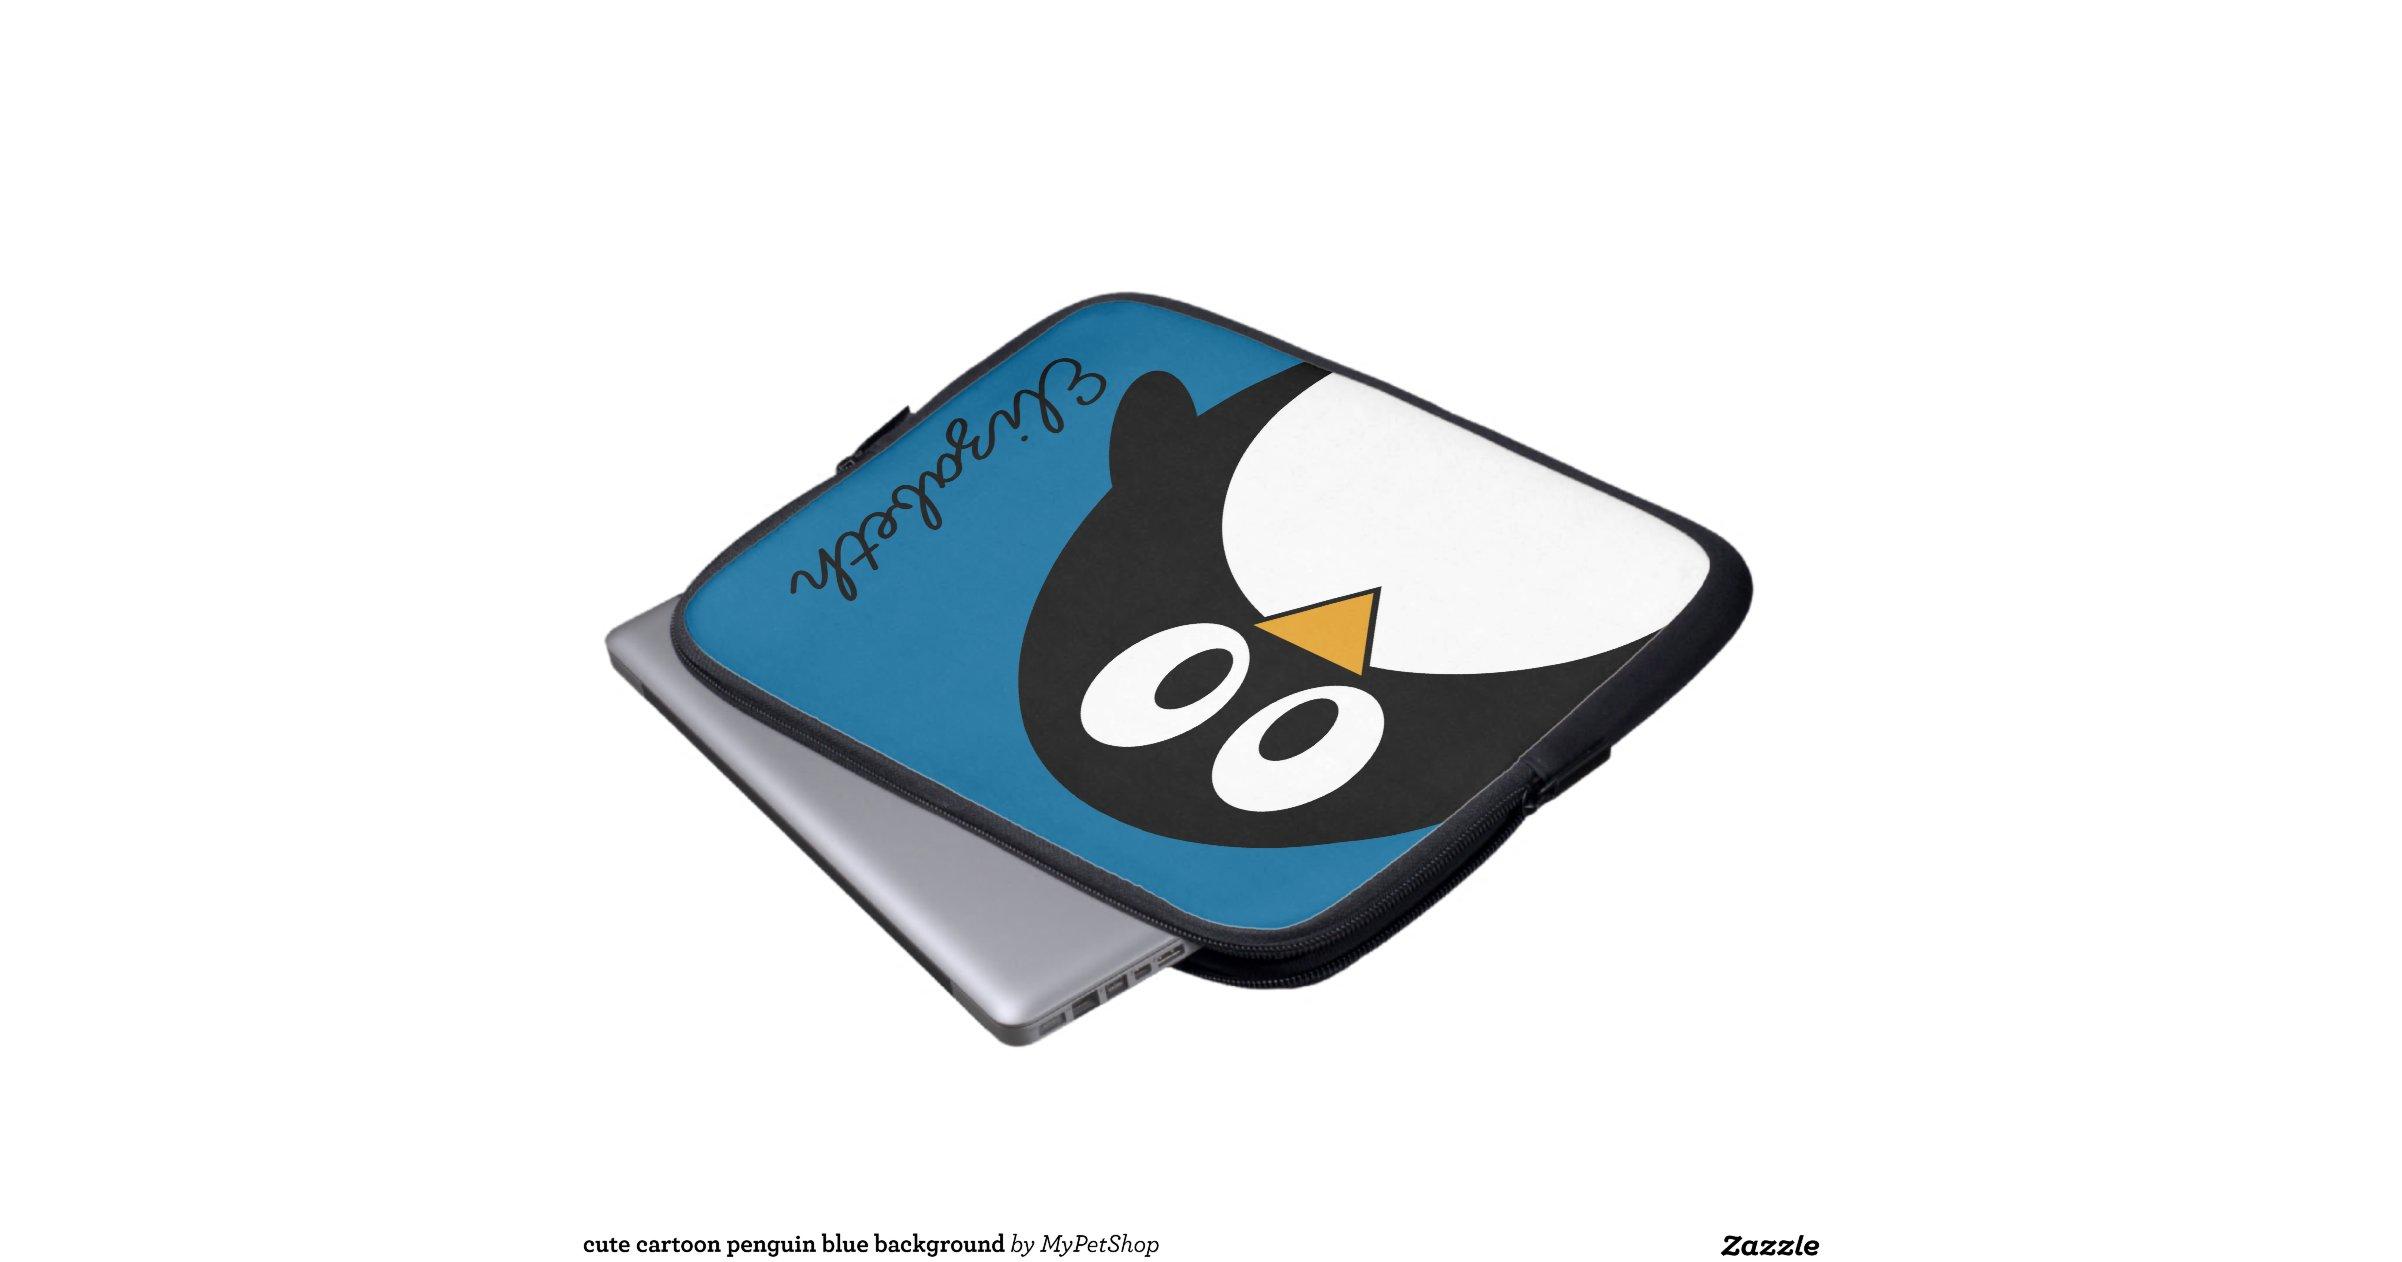 cute cartoon penguin blue background laptop sleeves | Zazzle